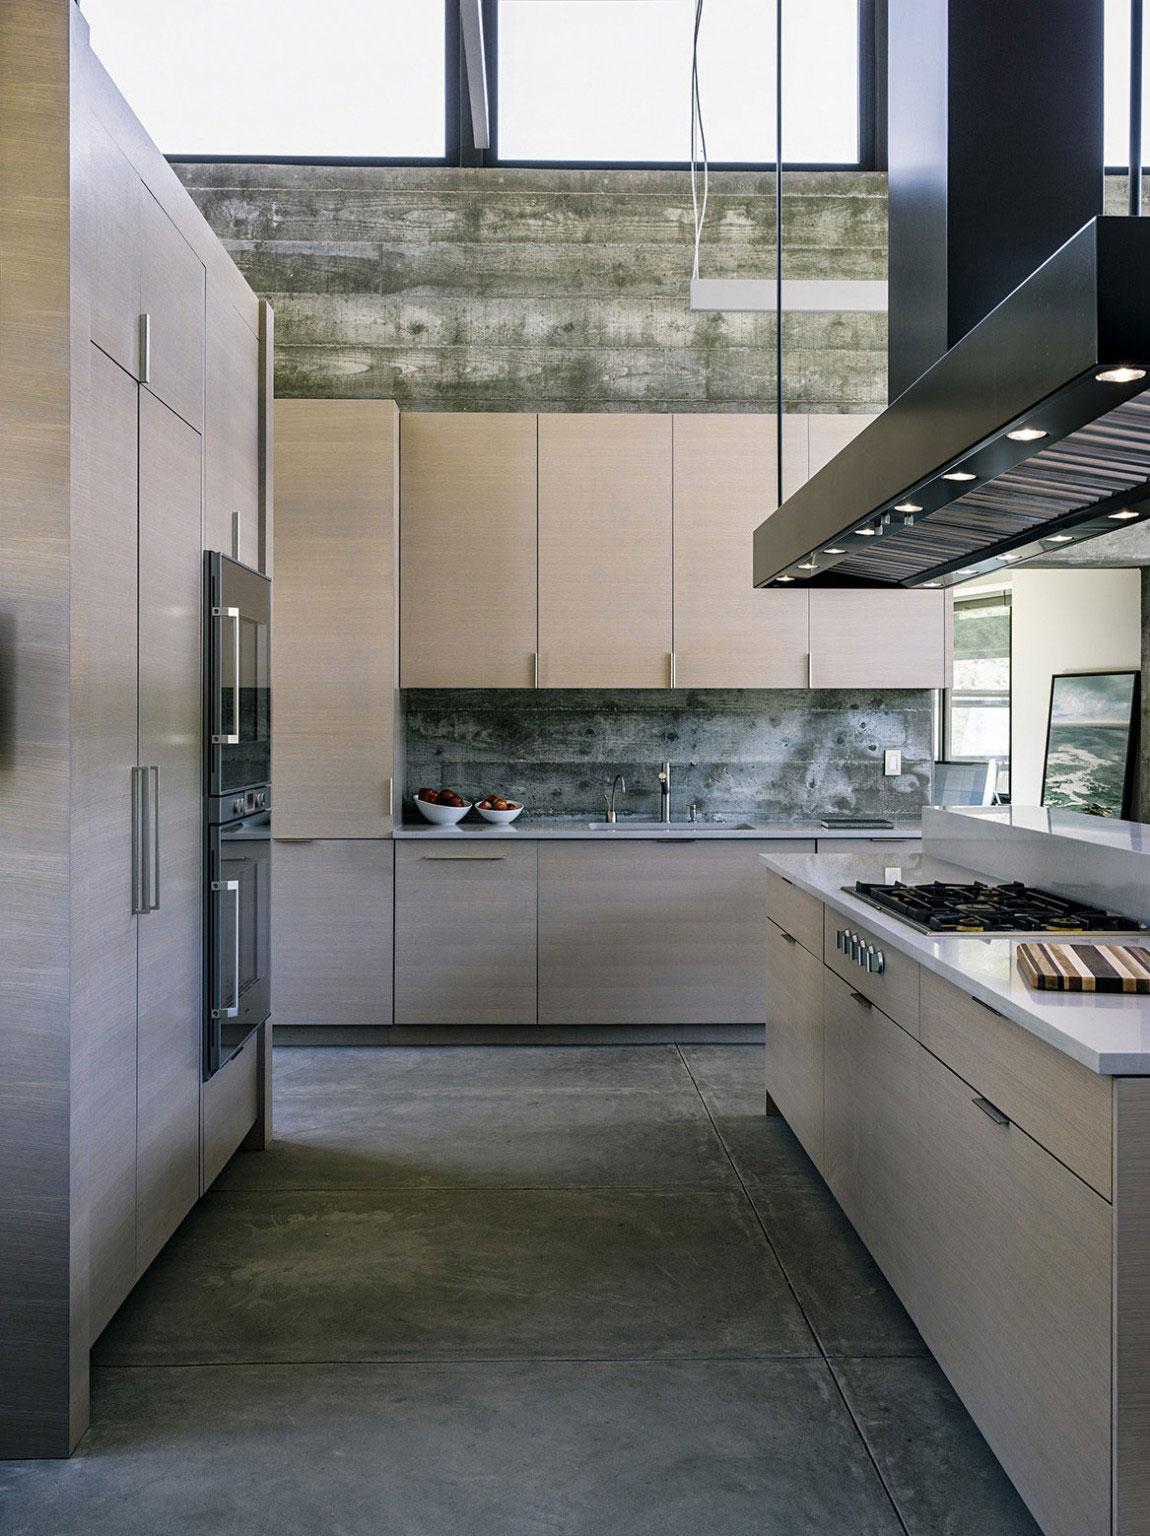 Create-A-Kitchen-Modern-Interior-Design-6 Create a Kitchen Modern Interior Design for a contemporary house